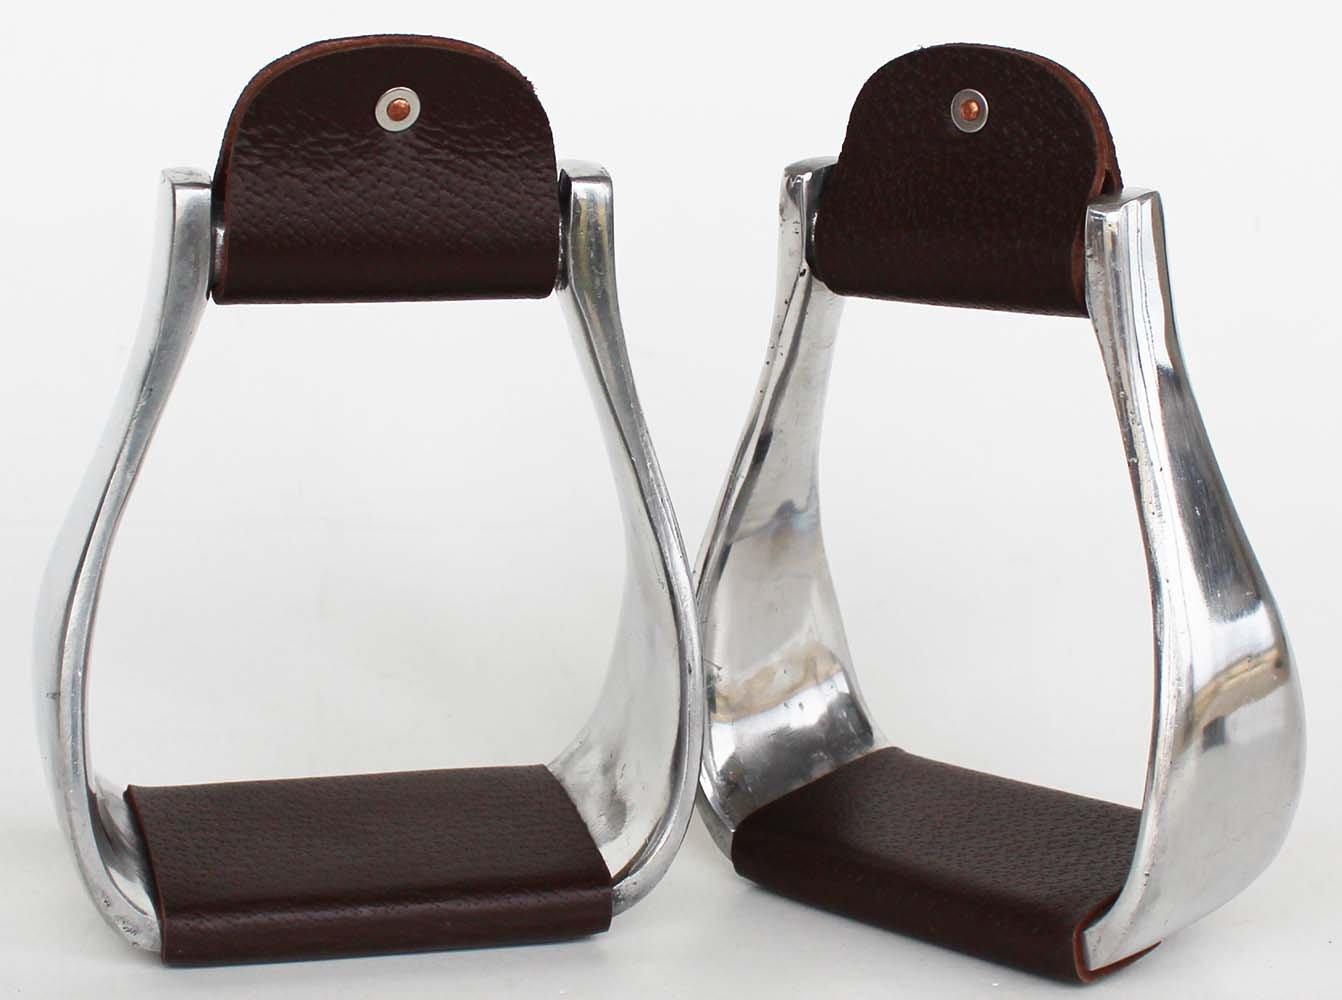 Pro Rider Horse Saddle Aluminum Western Stirrups Leather Tread Tack Adult Brown 51144